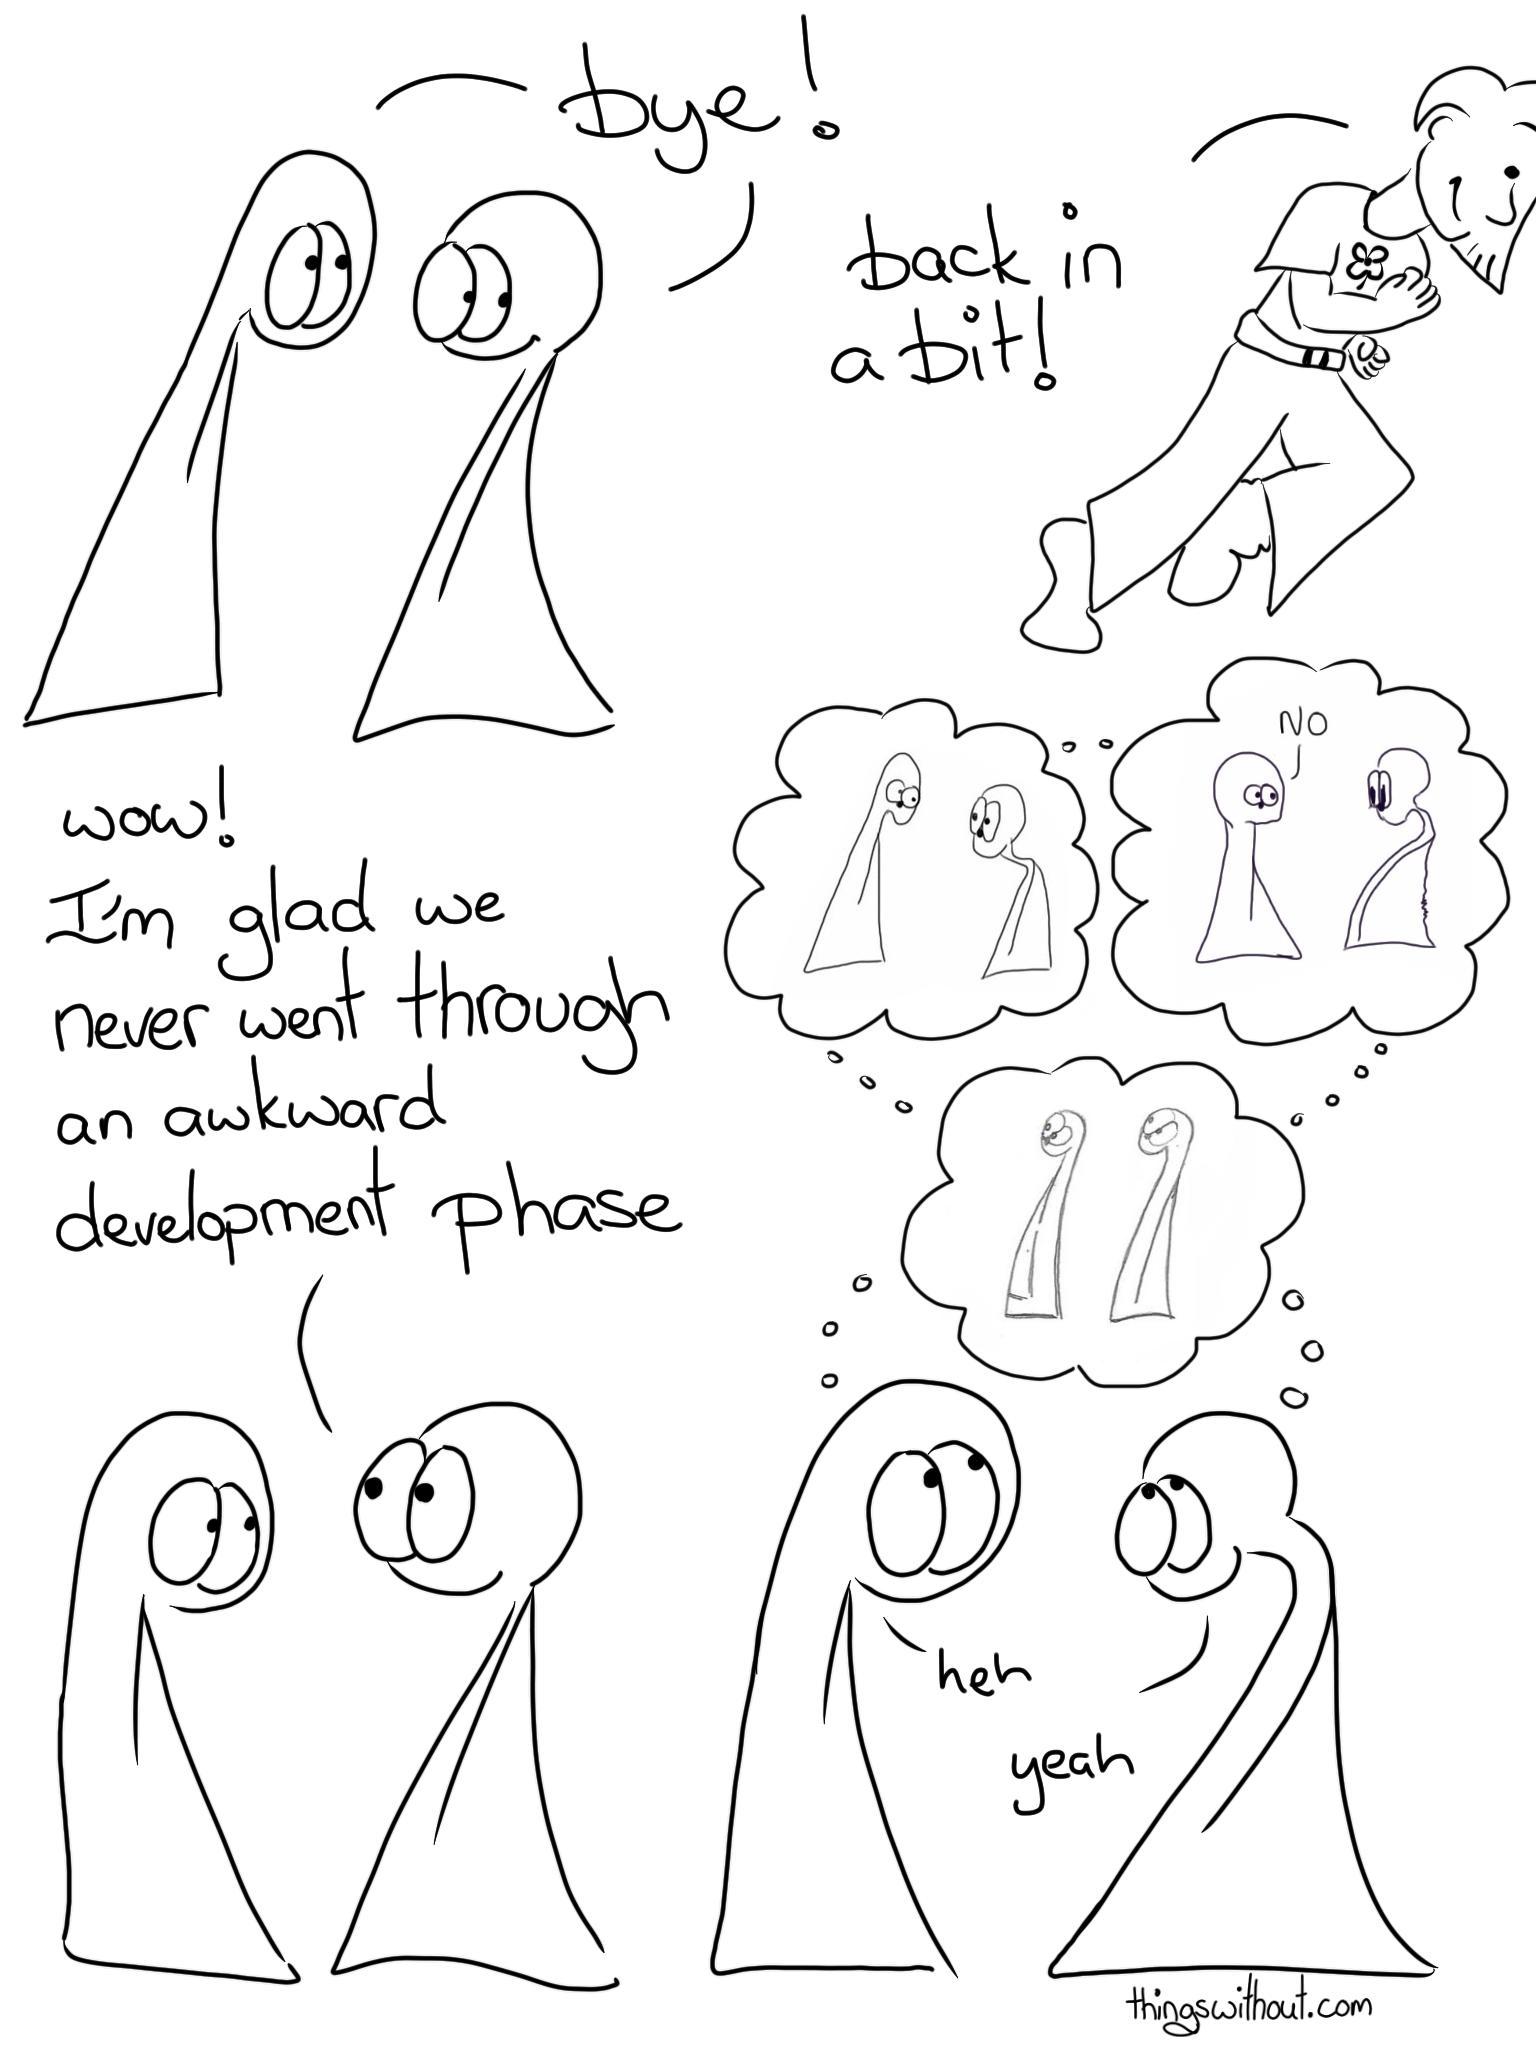 425: Awkward Development